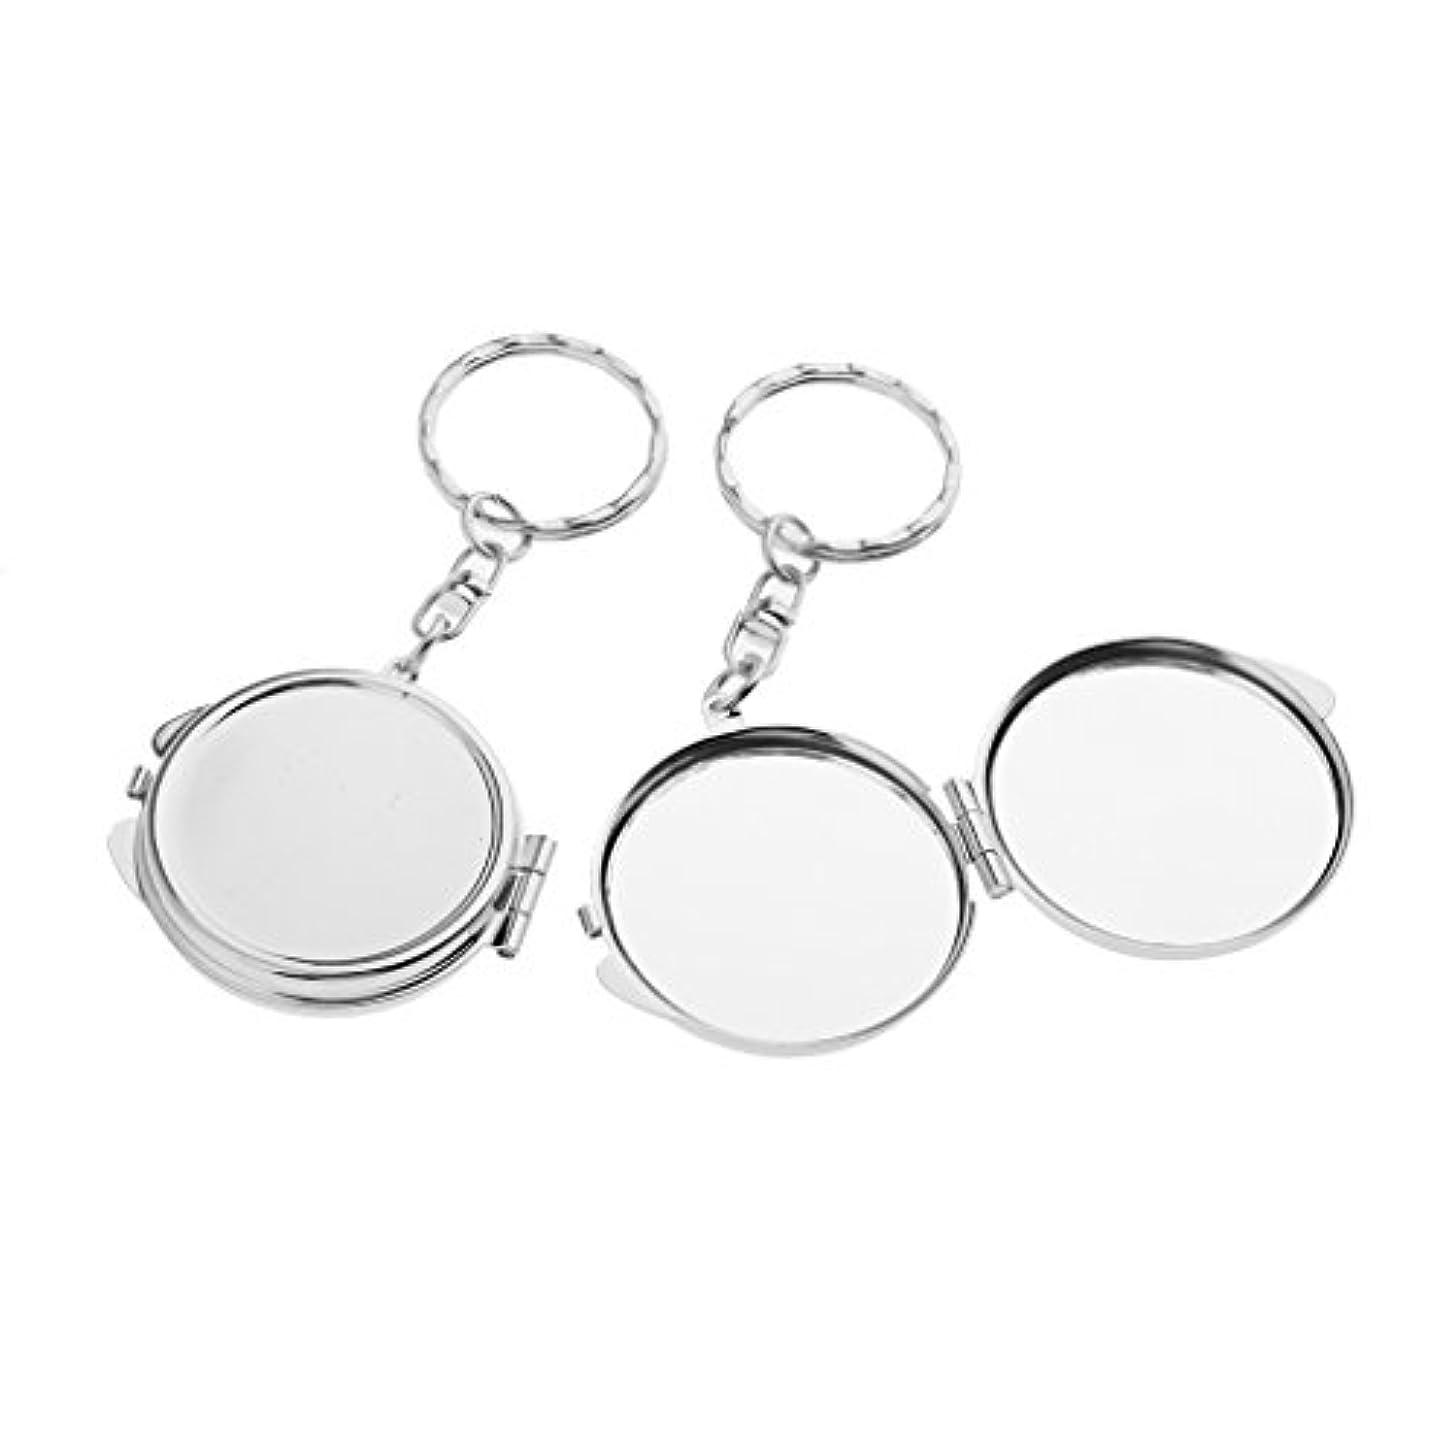 SONONIA ミニサイズ ミラー 両面 鏡 折りたたみ式 キーリング デコレーション 化粧鏡 4タイプ選べ - 1